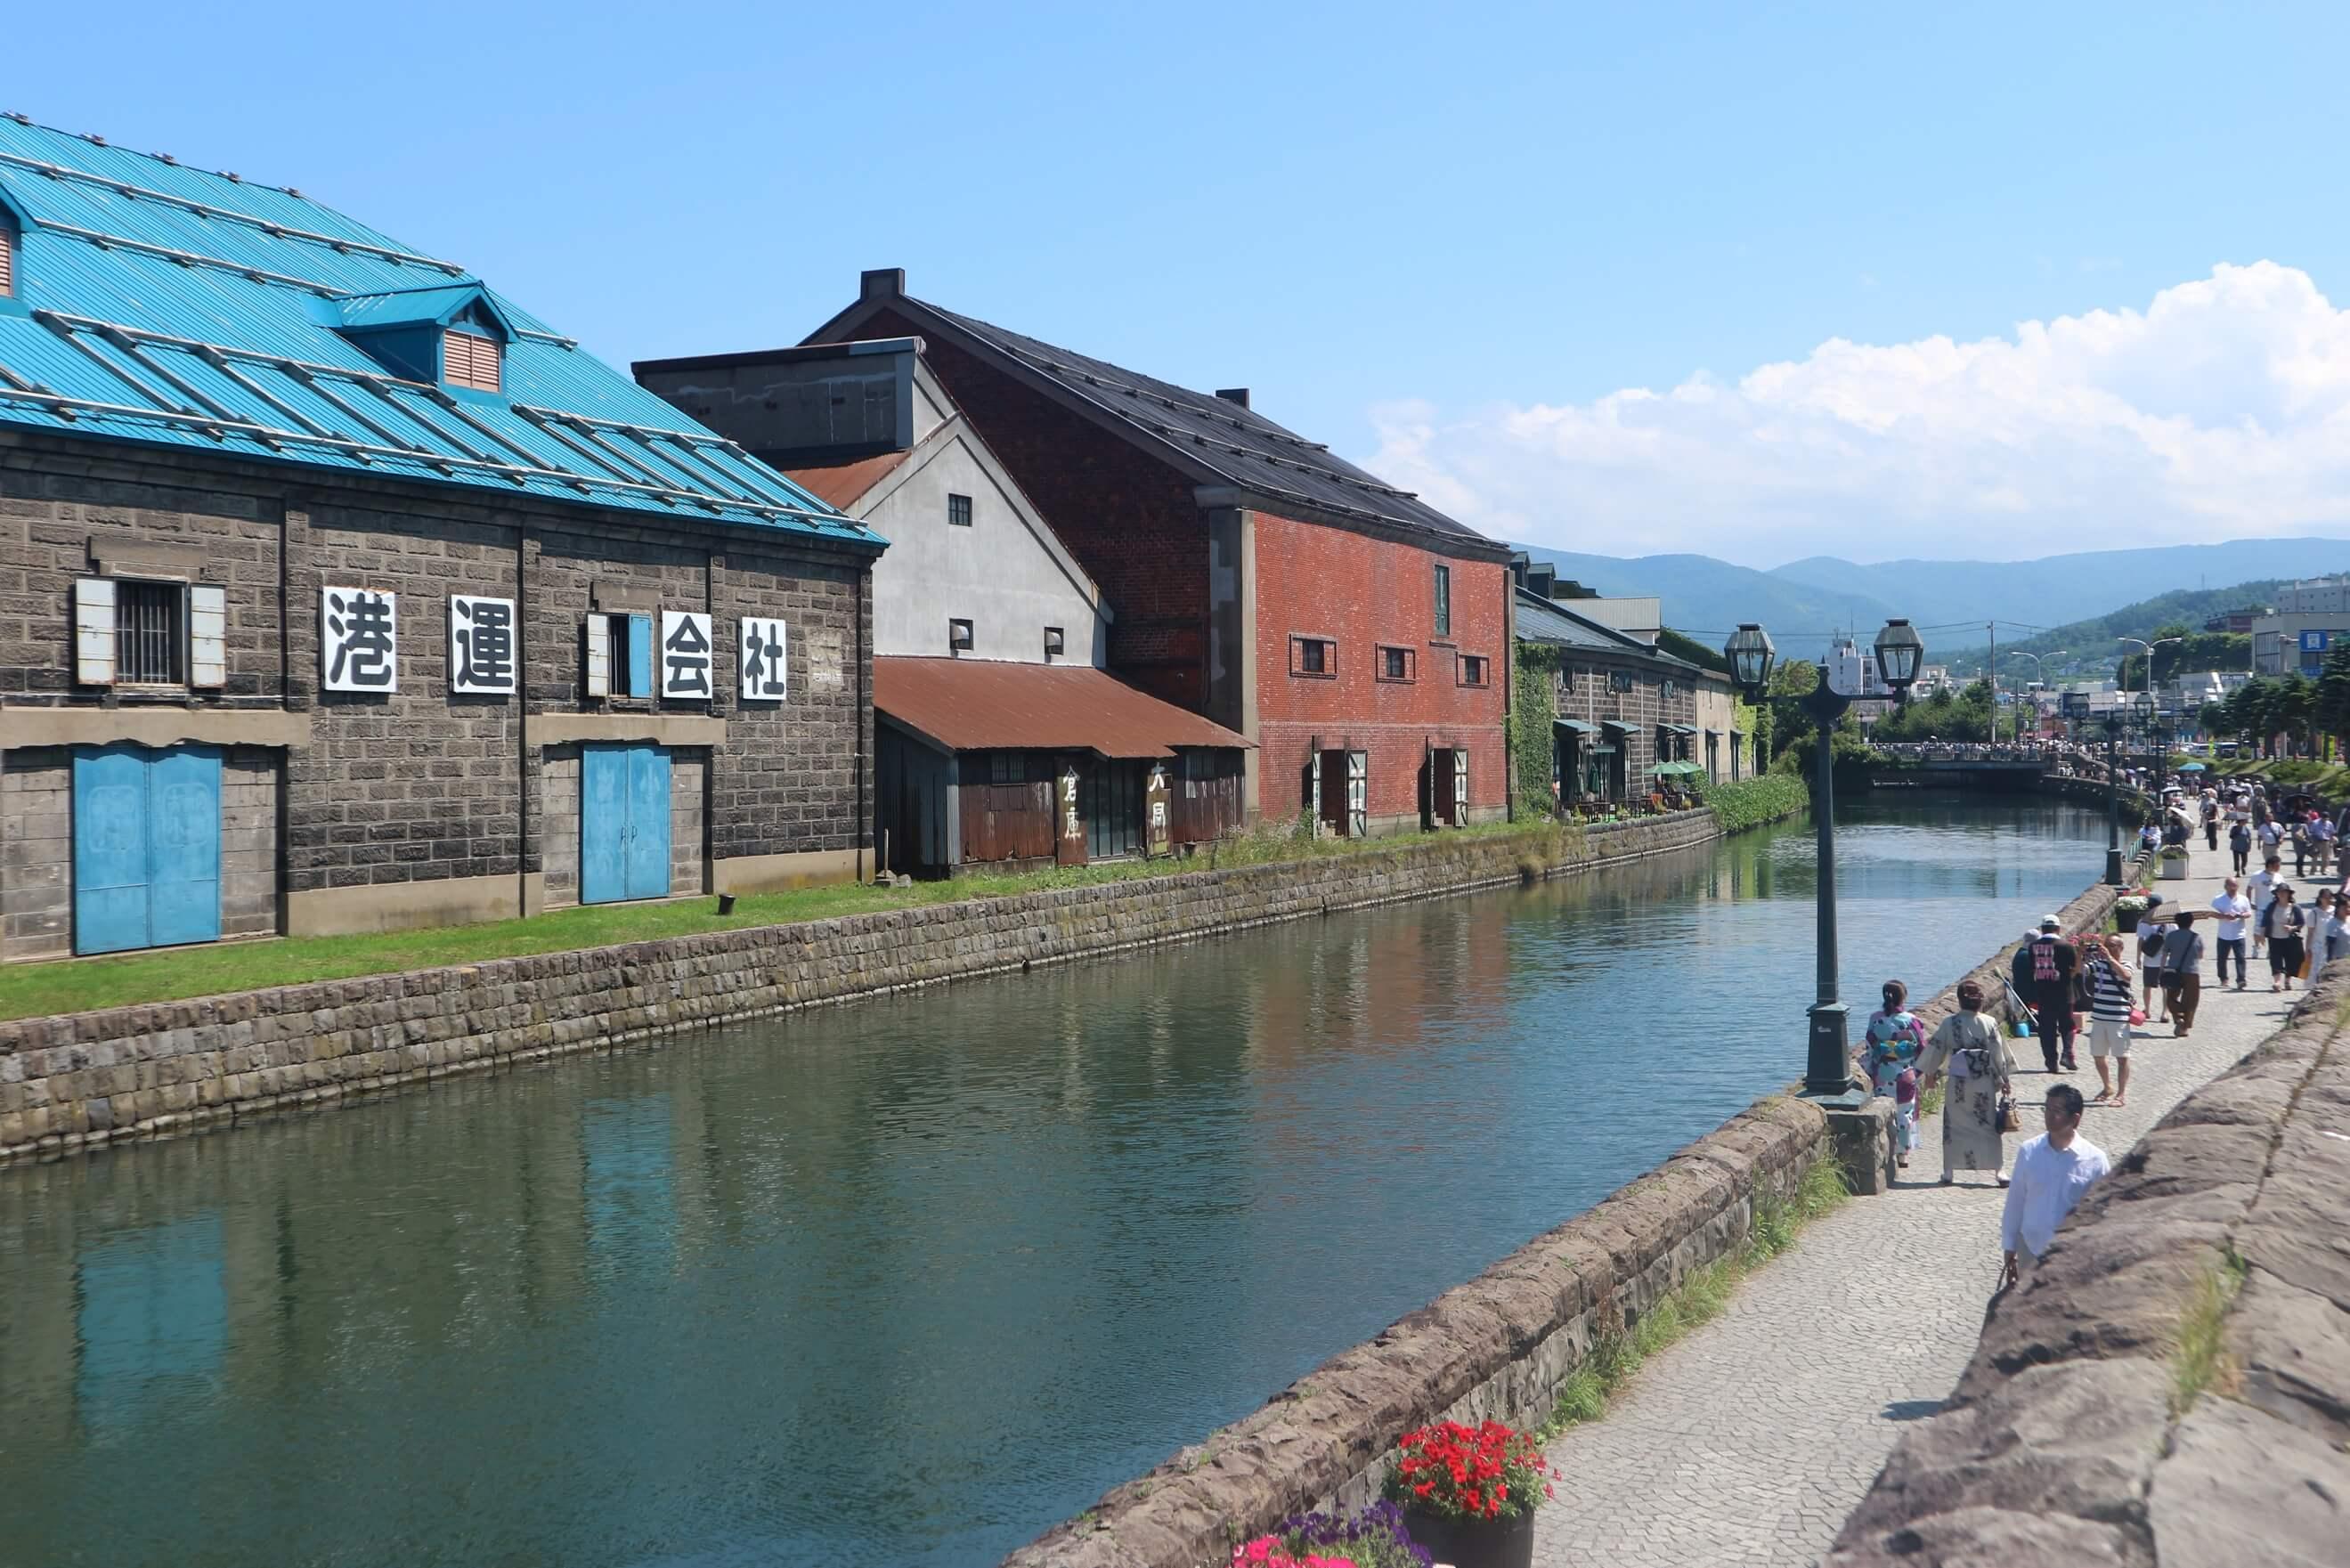 otaru kuzey japonya gezi rehberi - hokkaido